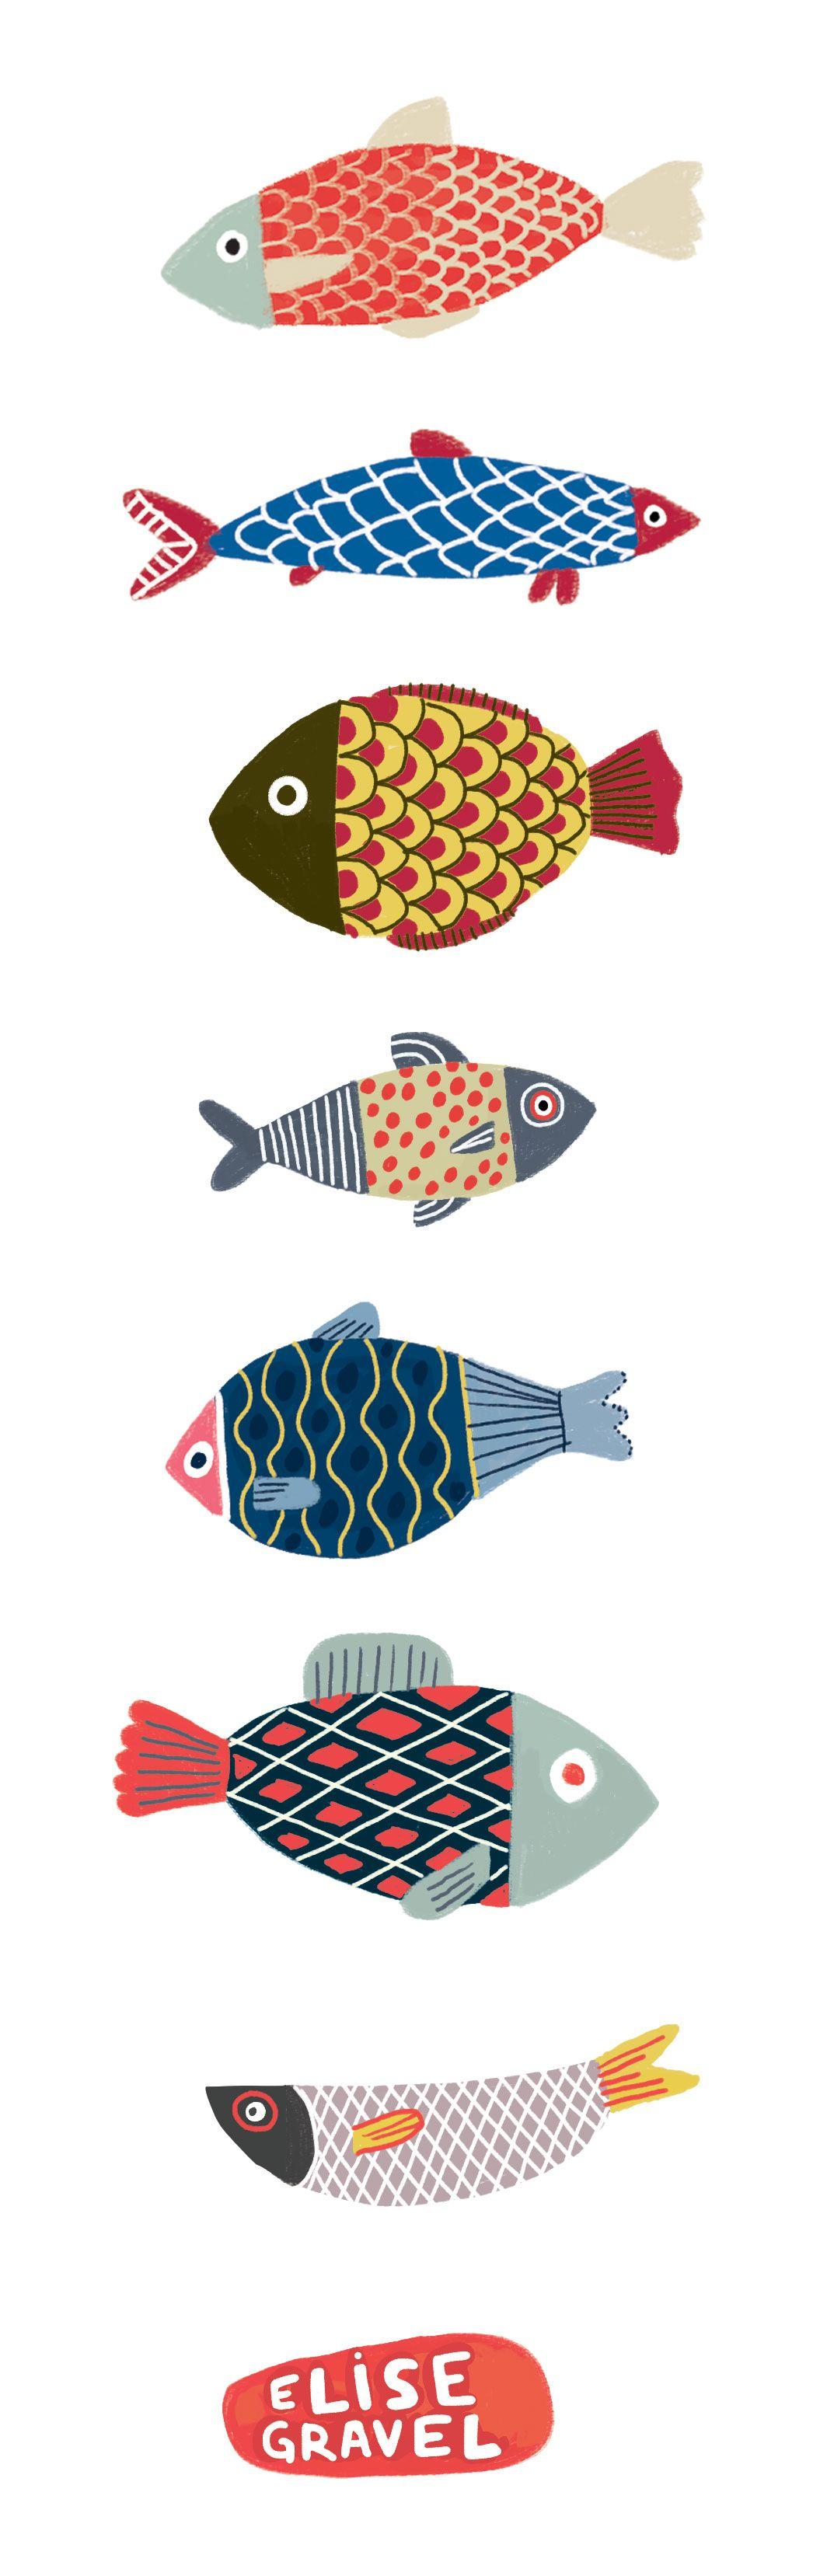 Elise Gravel illustration • fish • fun • art • cute • pattern ...